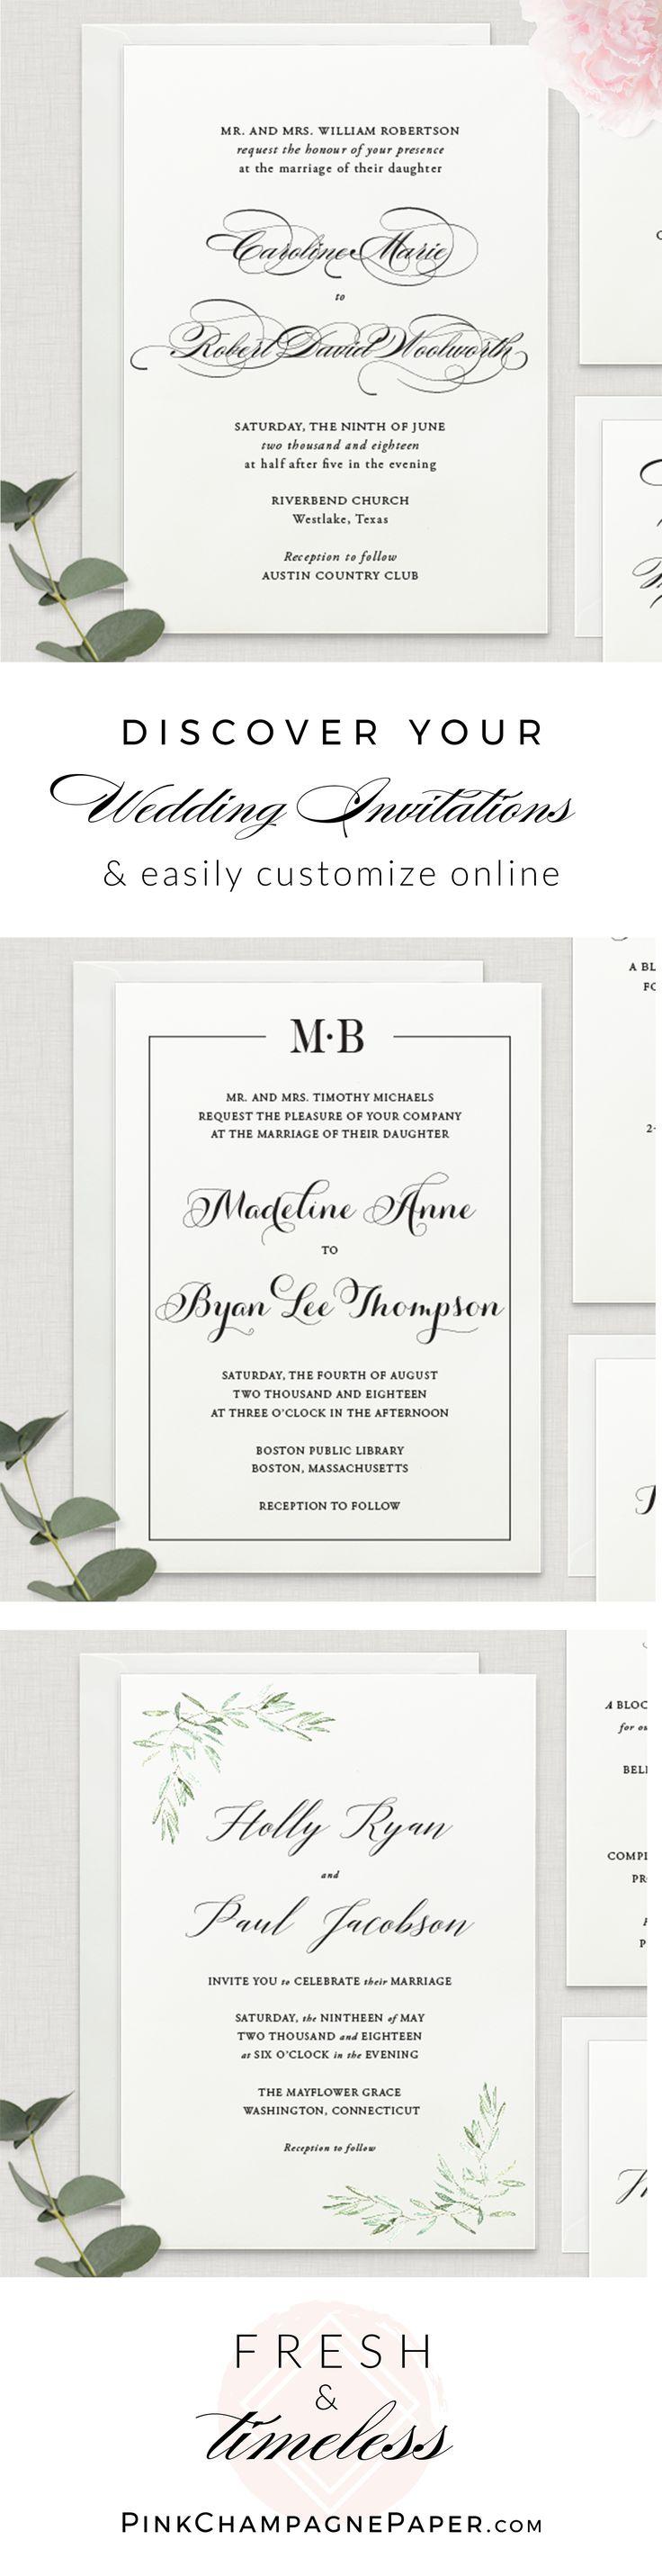 94 best Classic Wedding Invitations images on Pinterest   Classic ...